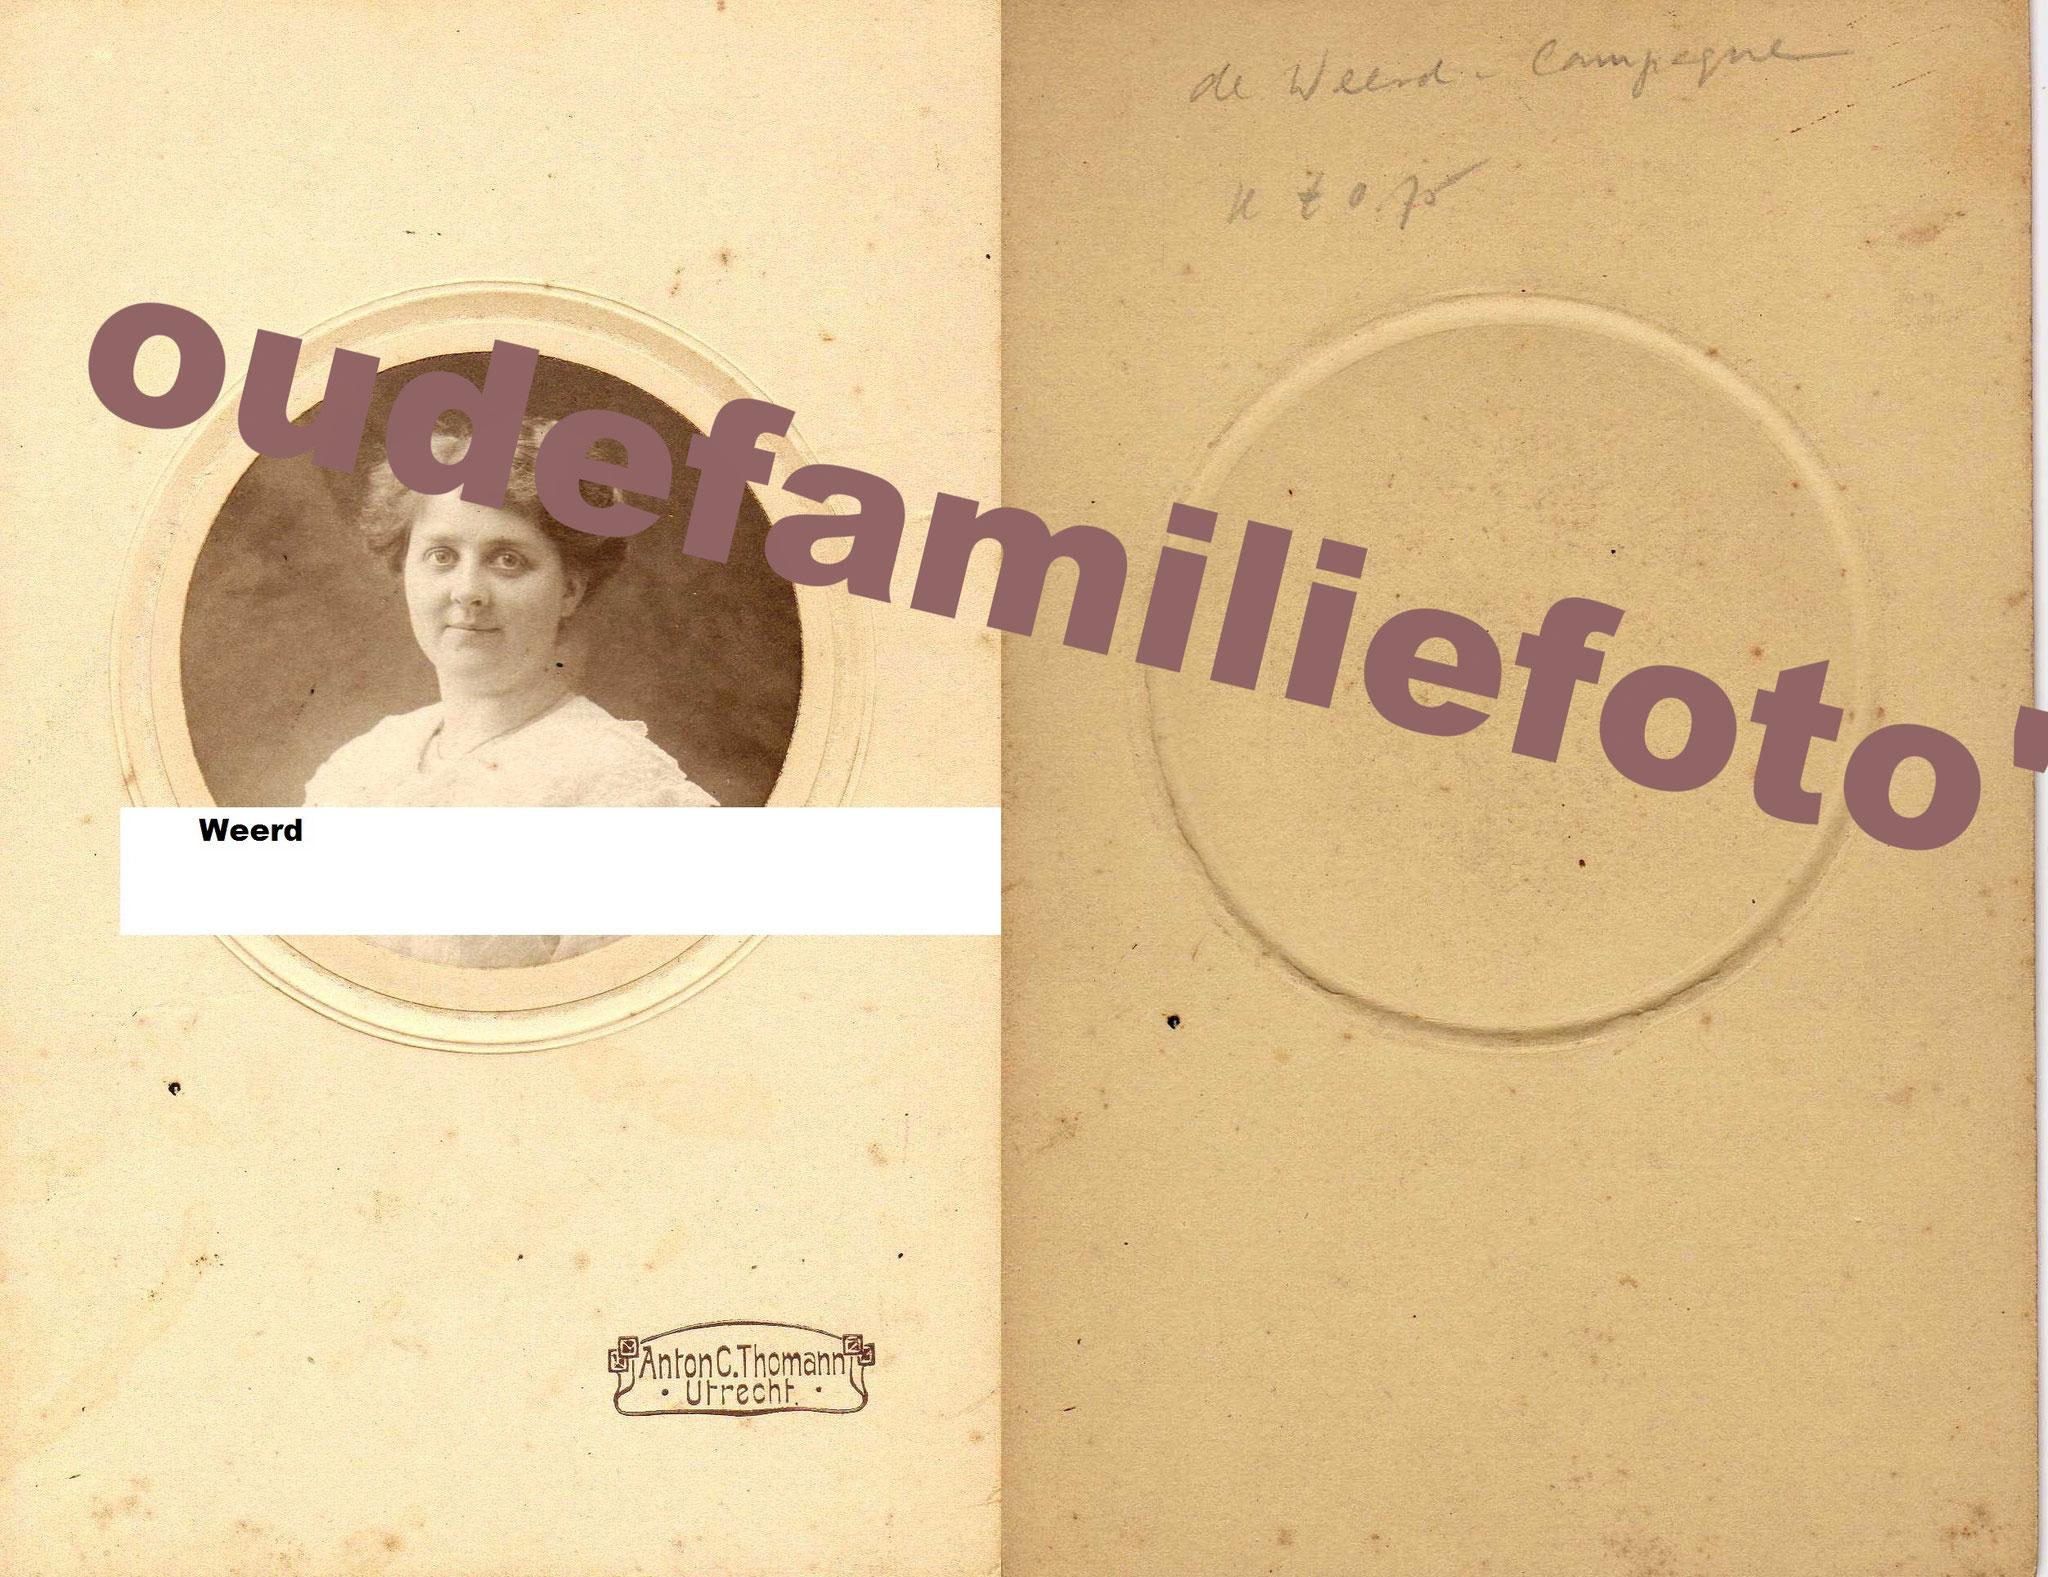 Campagne, Antonia Maria geb. 3 december 1884 gehuwd met Hendrikus Marinus de Weerd € 3,00